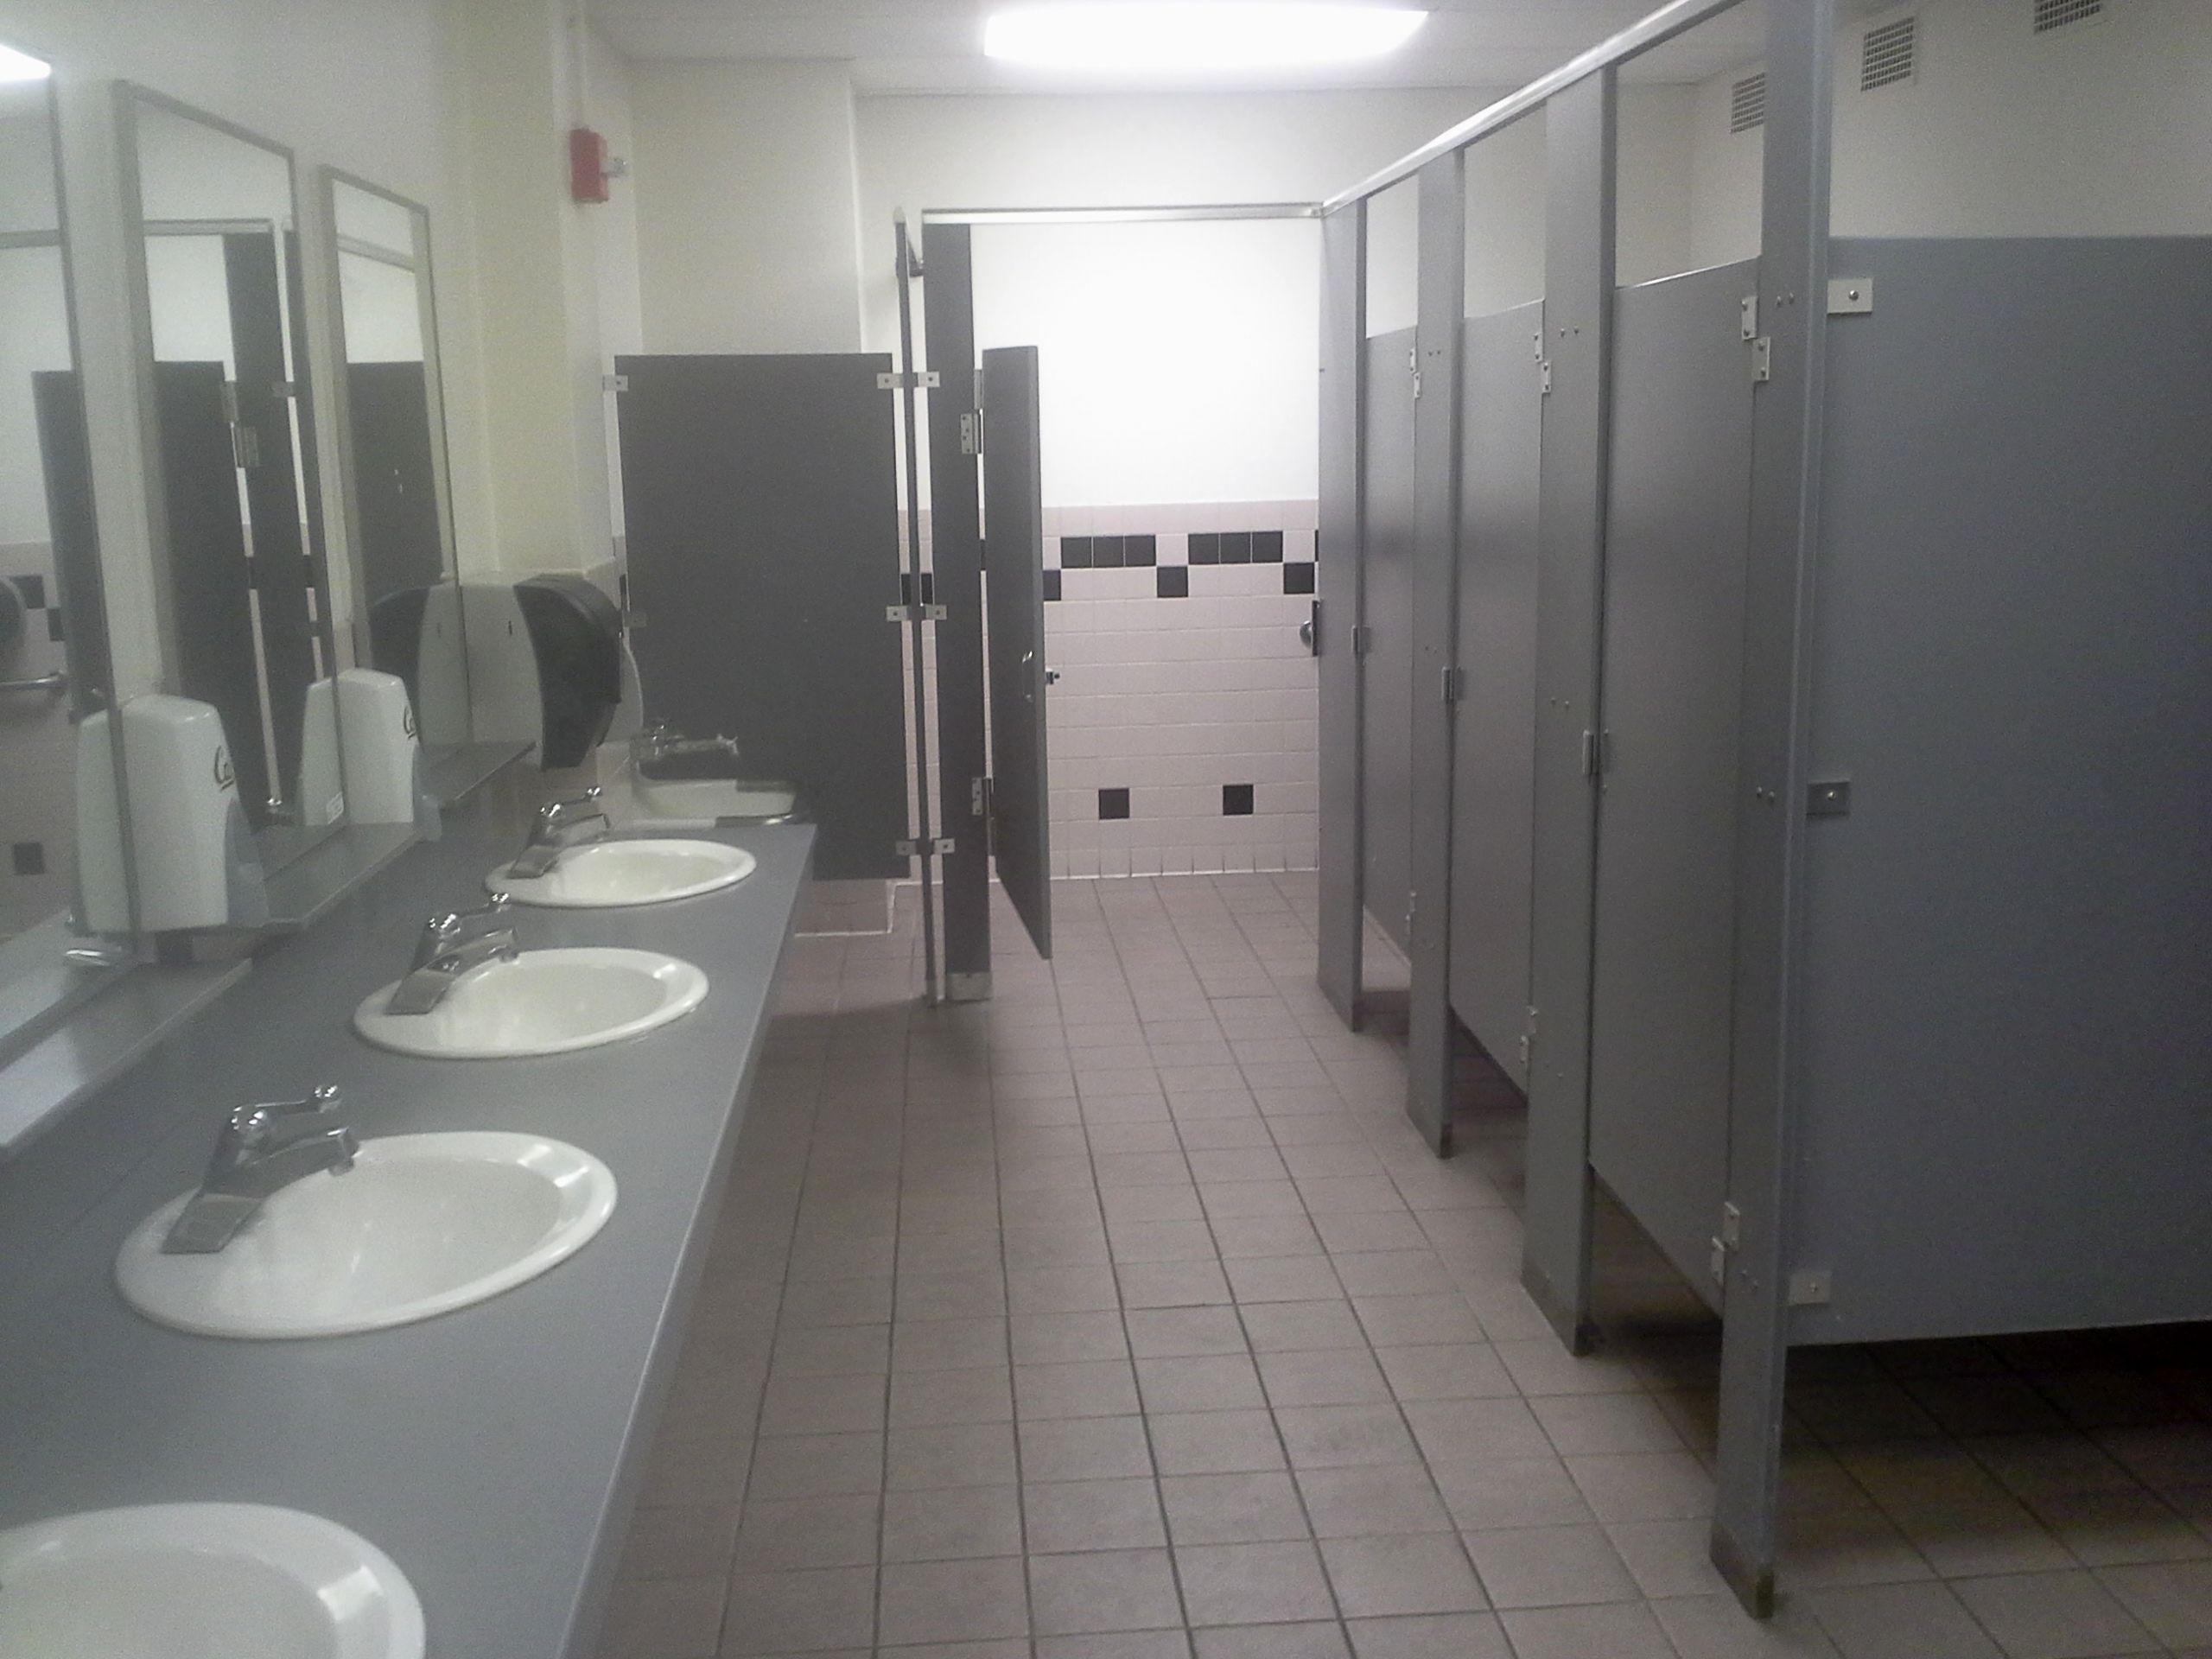 cool transgender bathrooms in schools model-Modern Transgender Bathrooms In Schools Picture